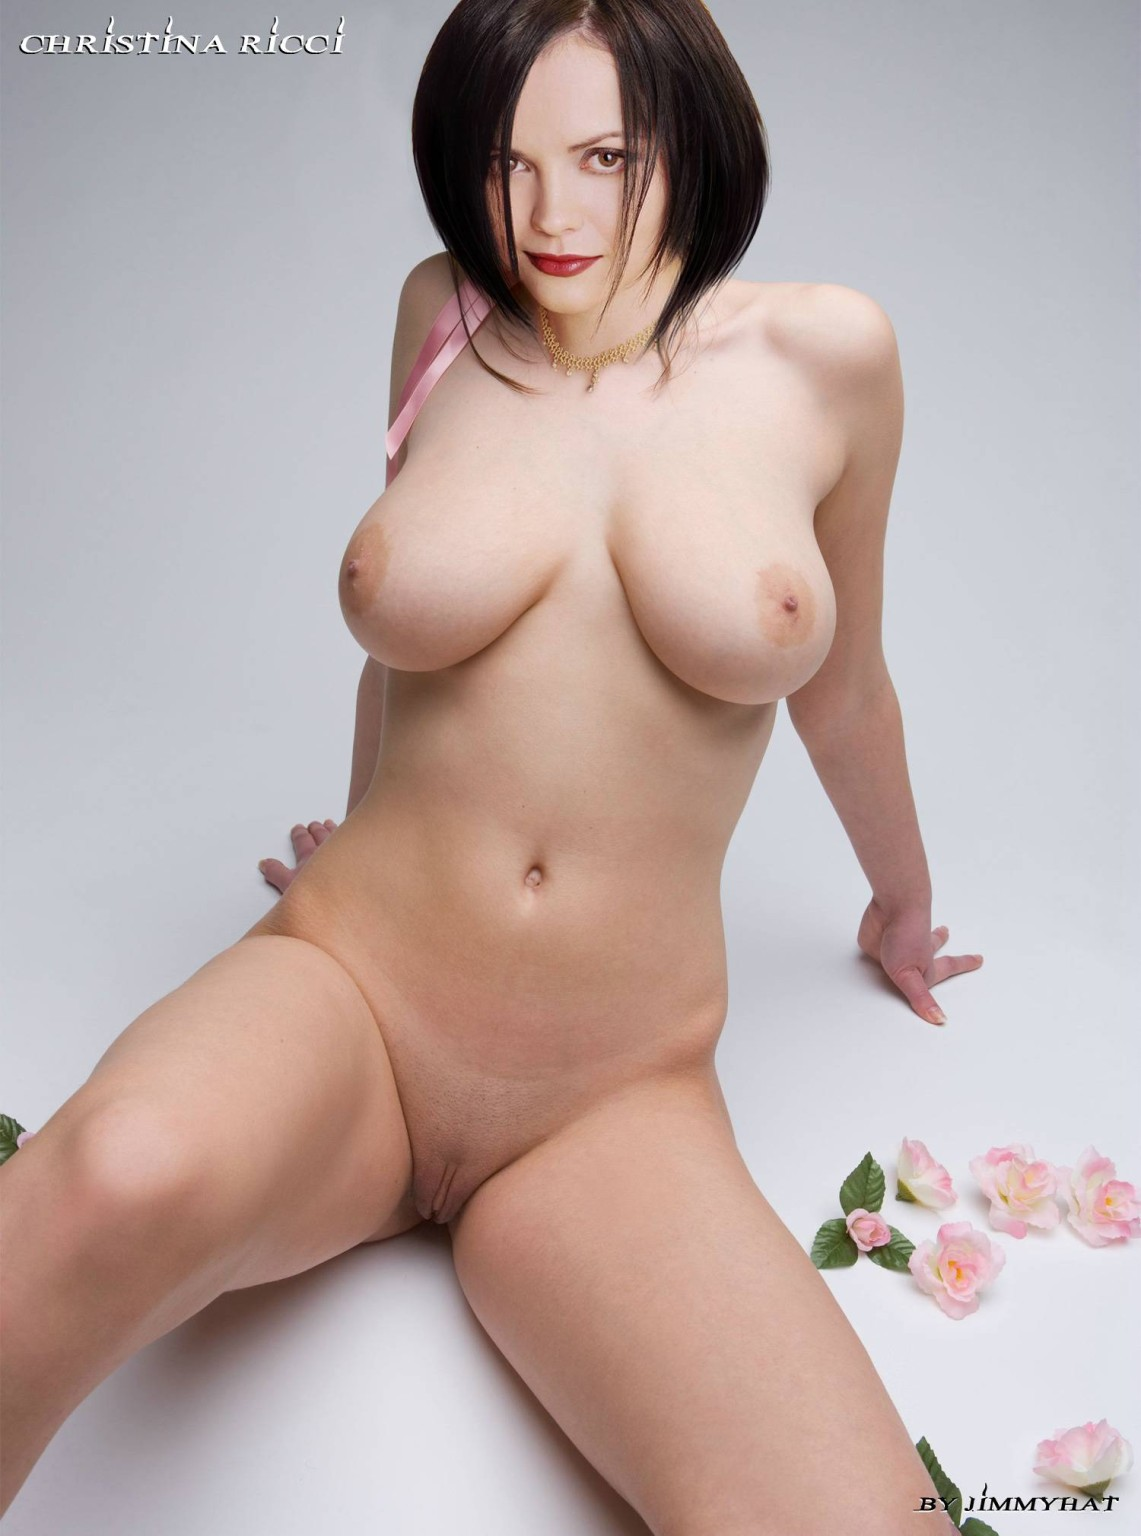 Ricci fake porn christina